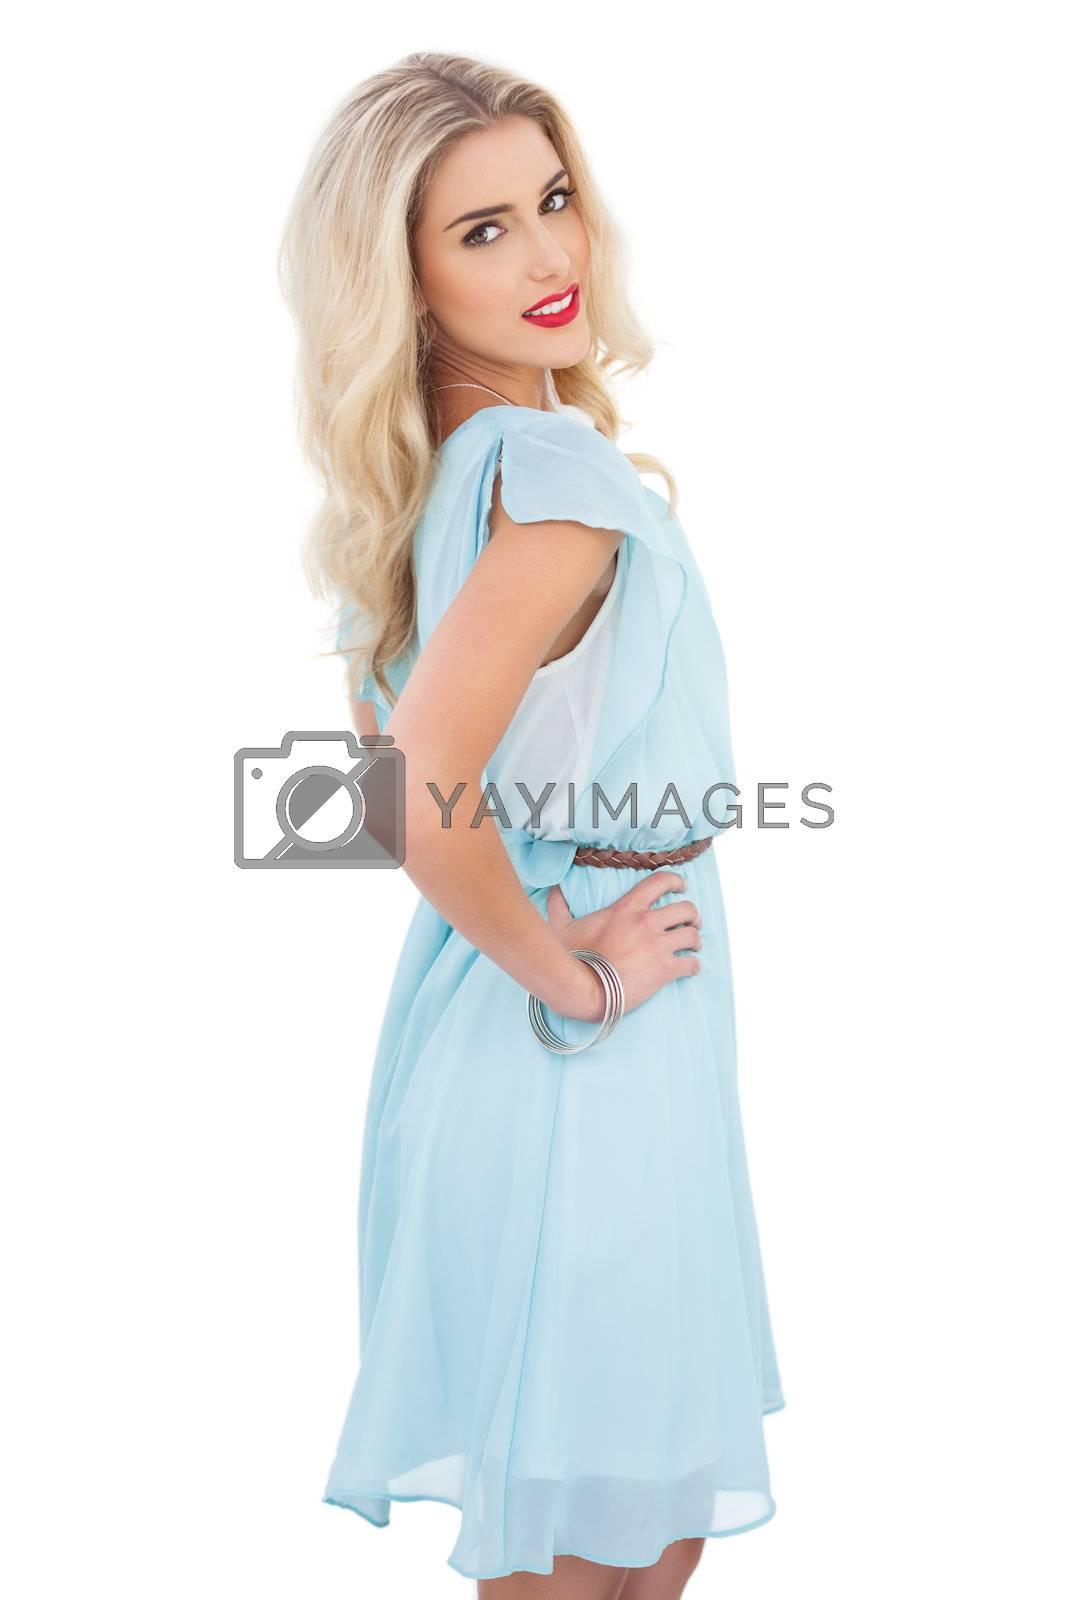 Pretty blonde model in blue dress posing hand on the hip by Wavebreakmedia